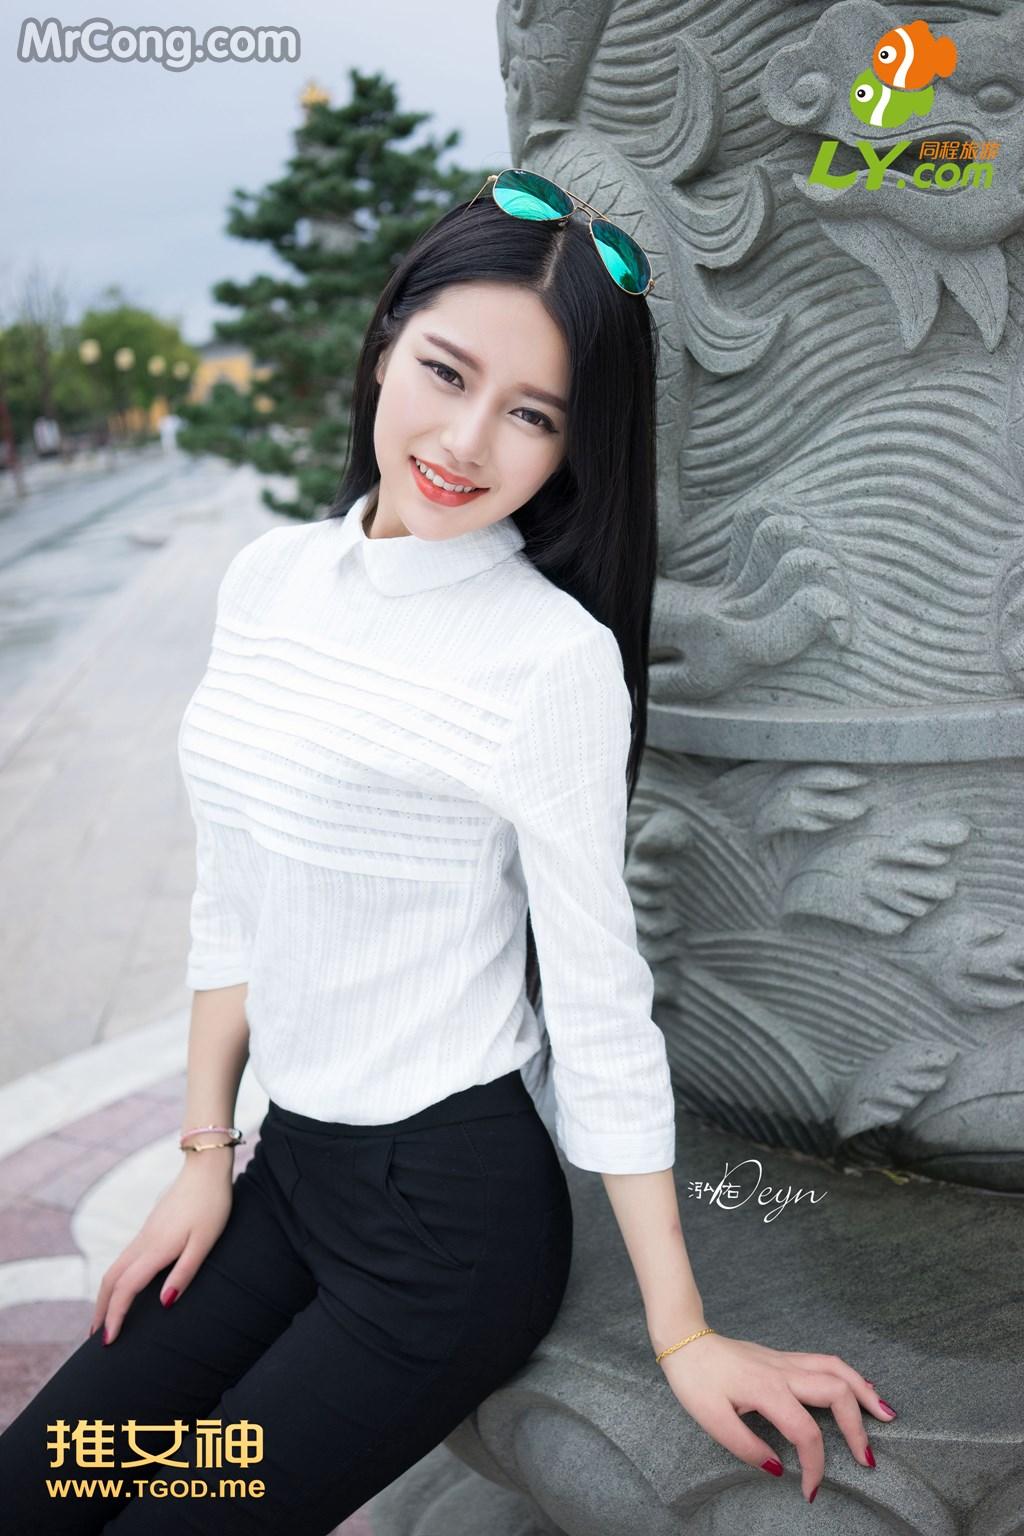 TGOD 2014-09-24: Model Xu Yan Xin (徐妍馨) (66 pictures)